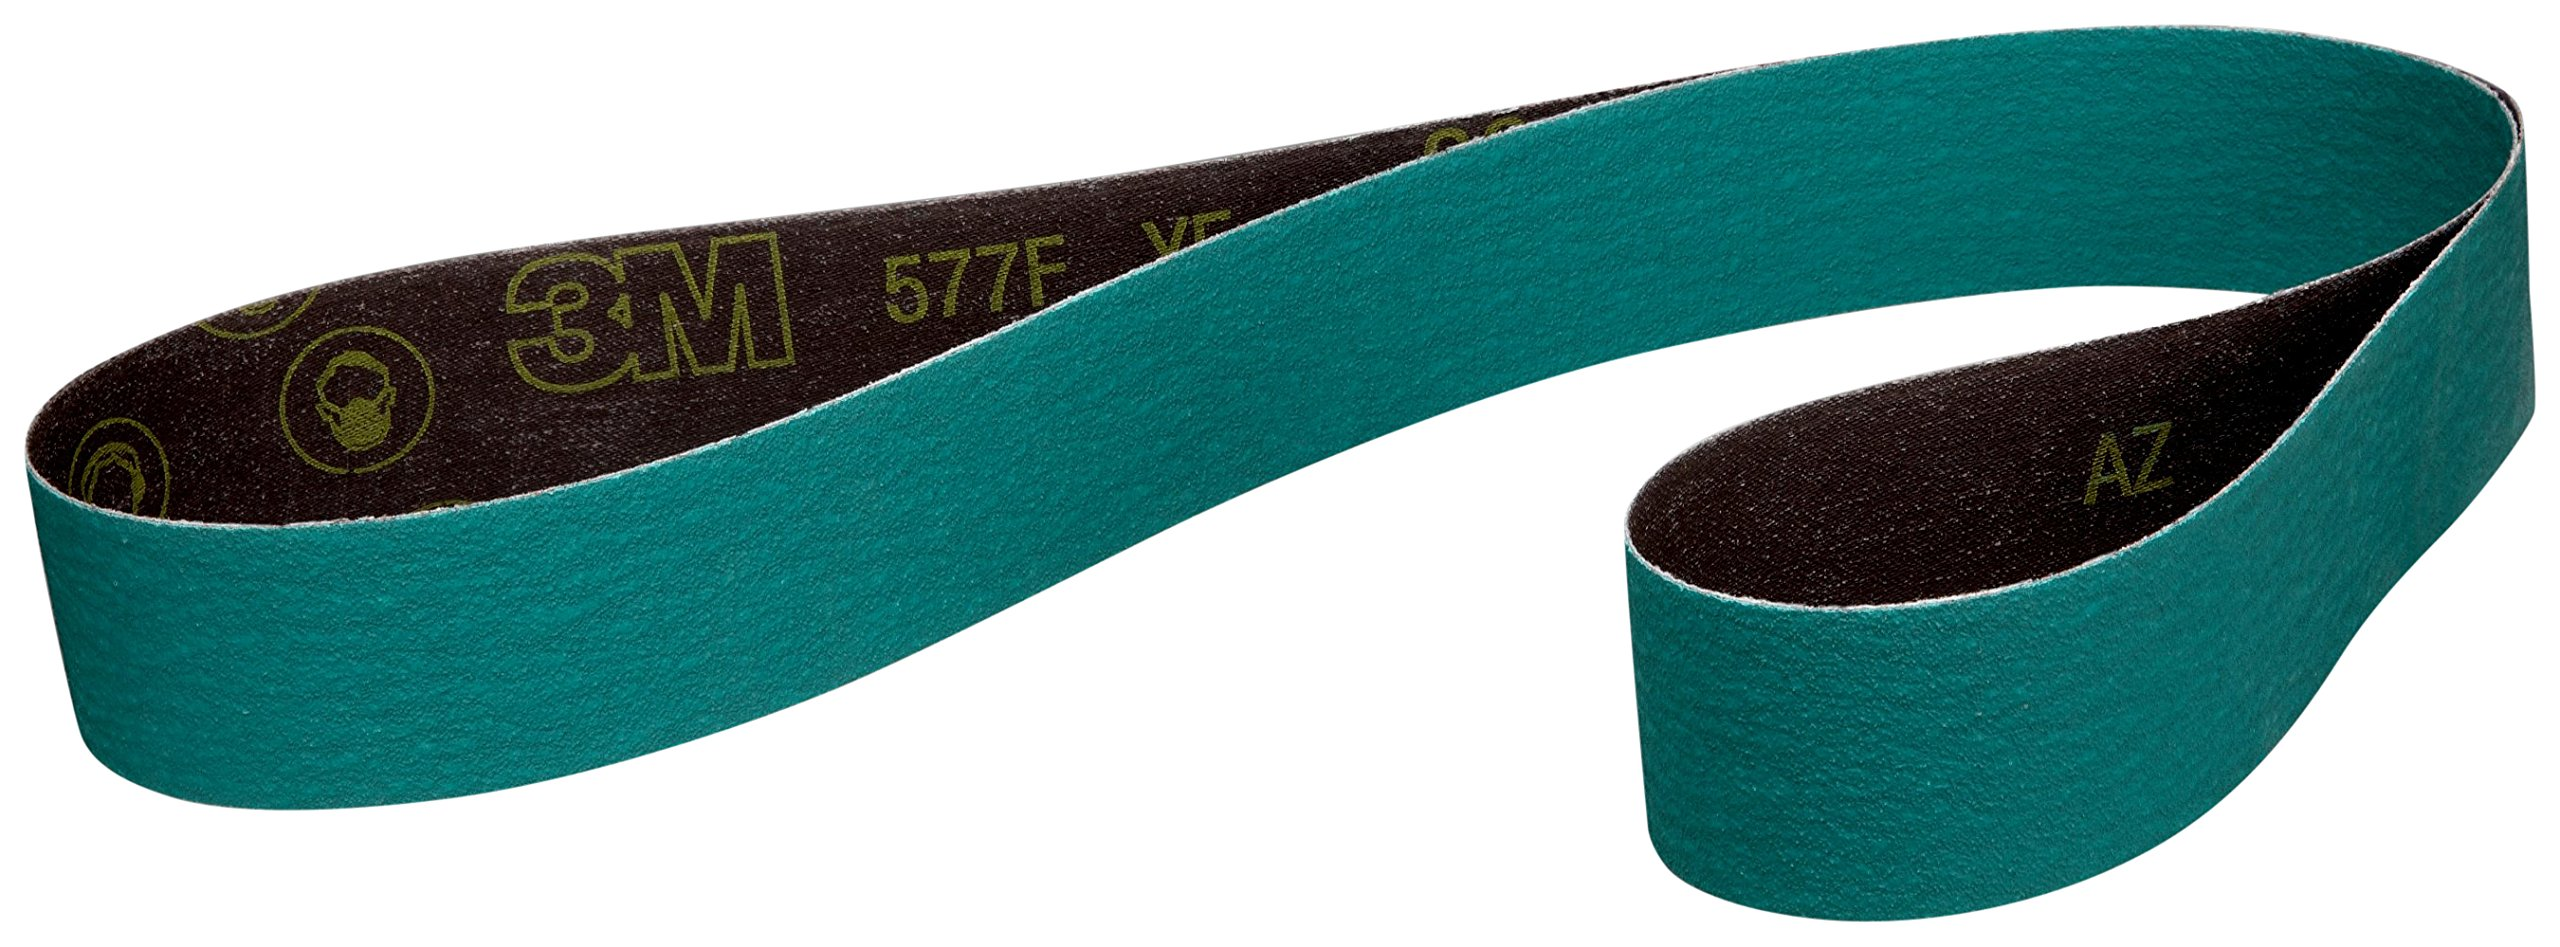 3M Cloth Belt 70890-case 577F, 2'' x 72'' 36 YF-Weight, Alumina Zirconia, Green (Pack of 50) by 3M